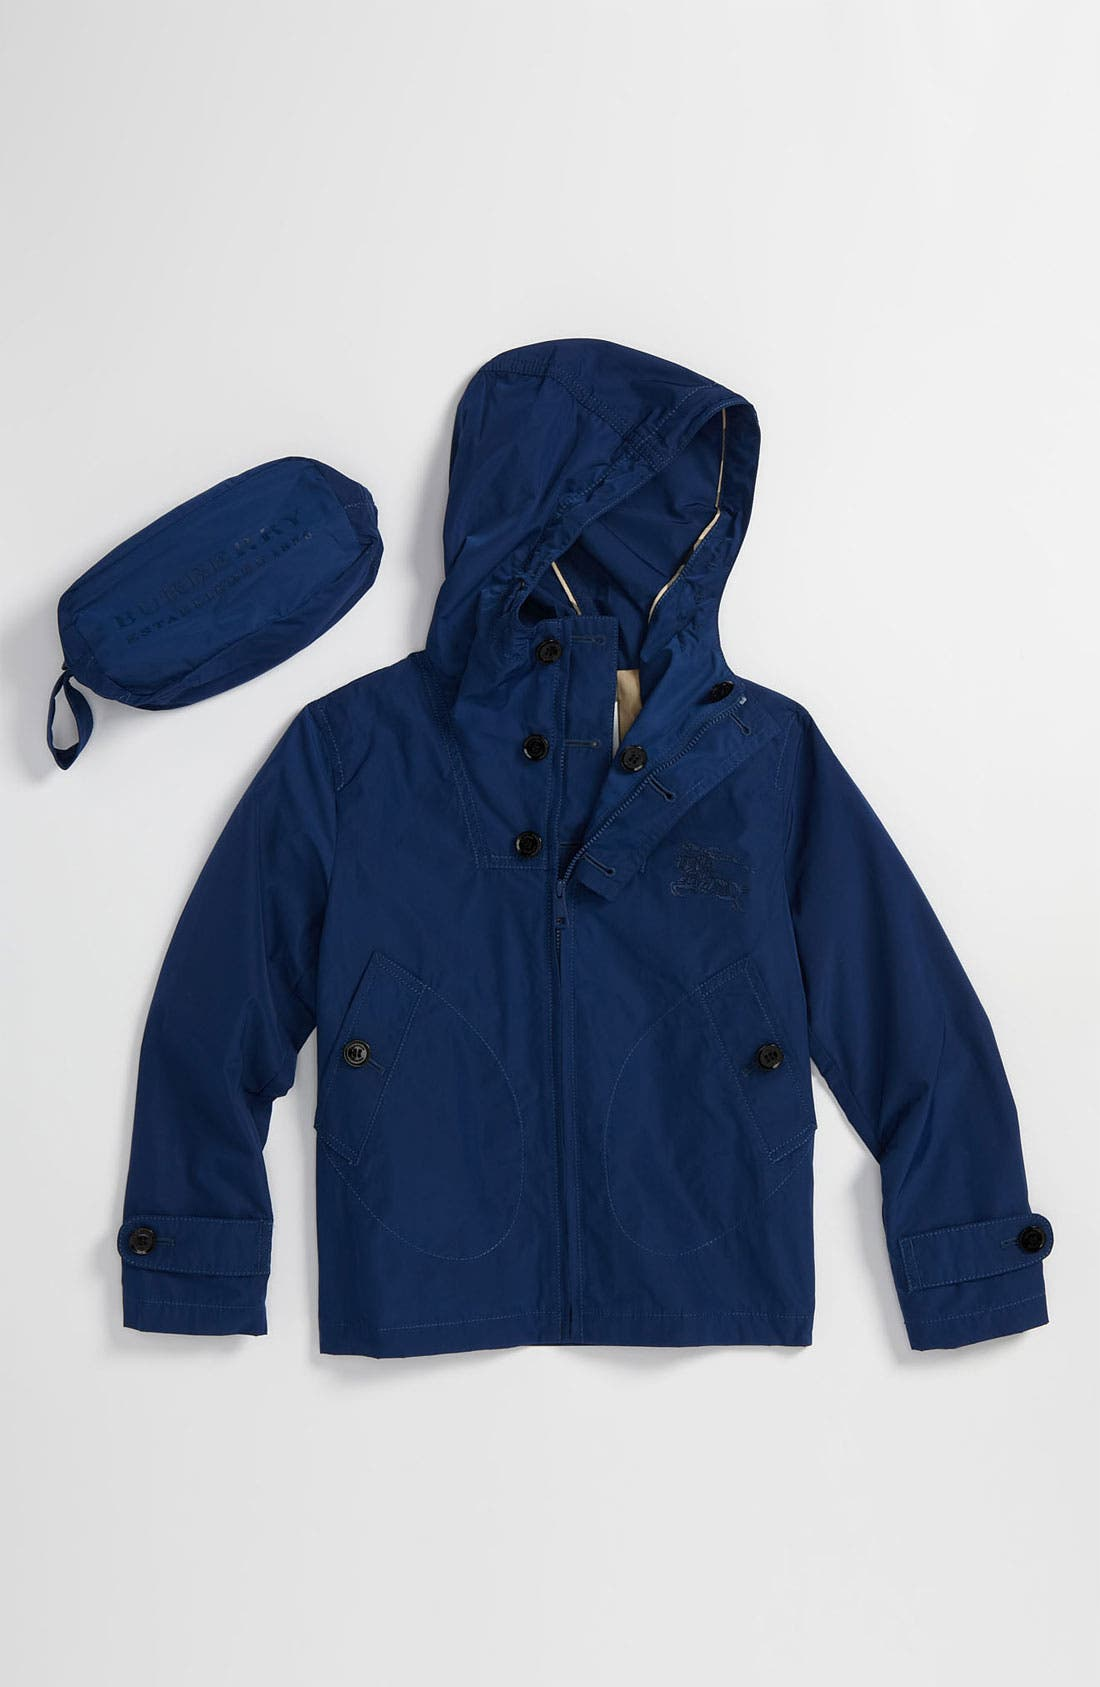 Main Image - Burberry Packable Jacket (Little Boys & Big Boys)